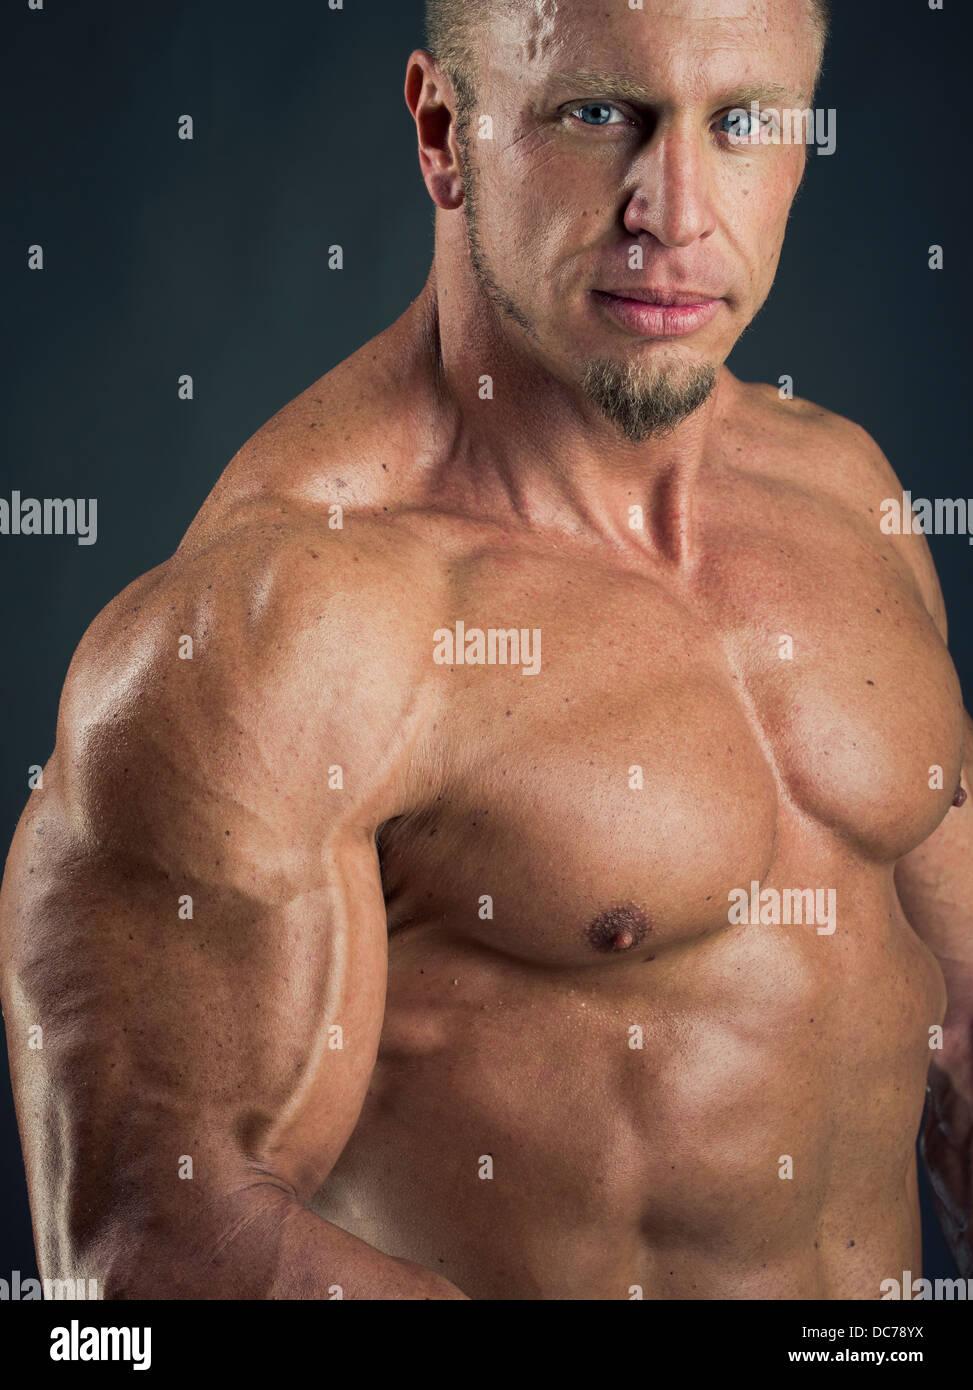 Male bodybuilder - Stock Image